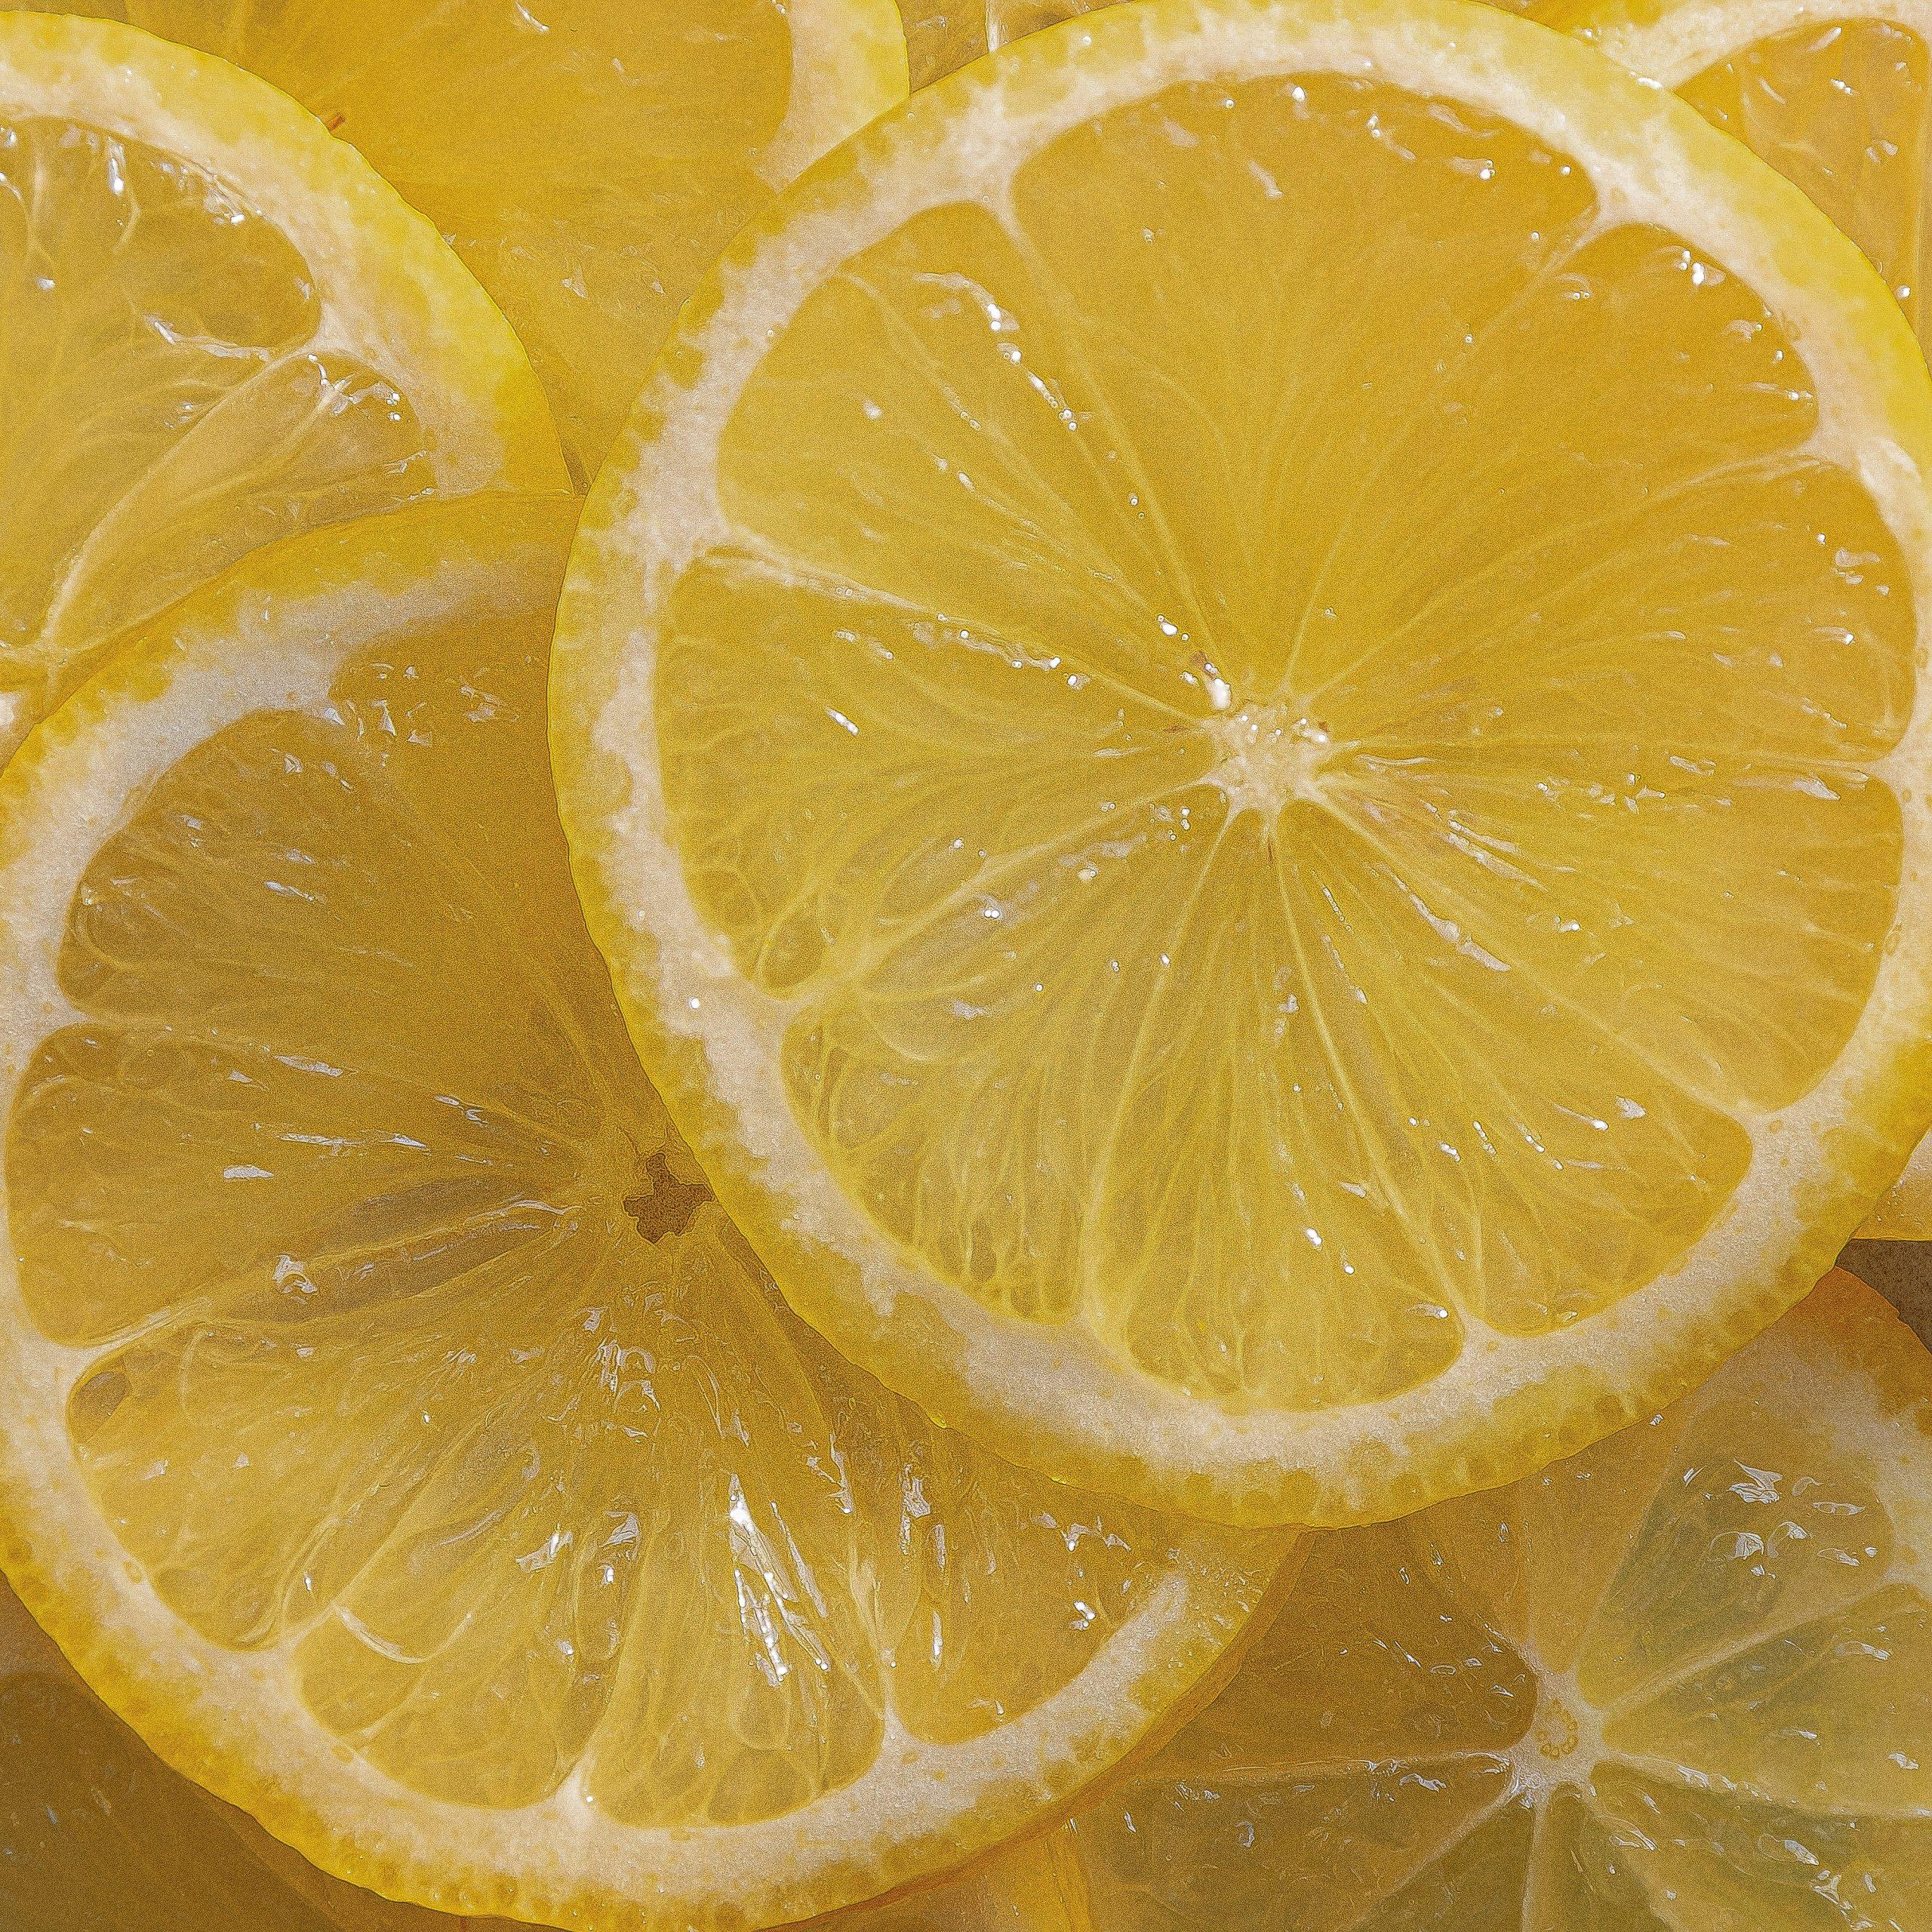 Lemon Glaze